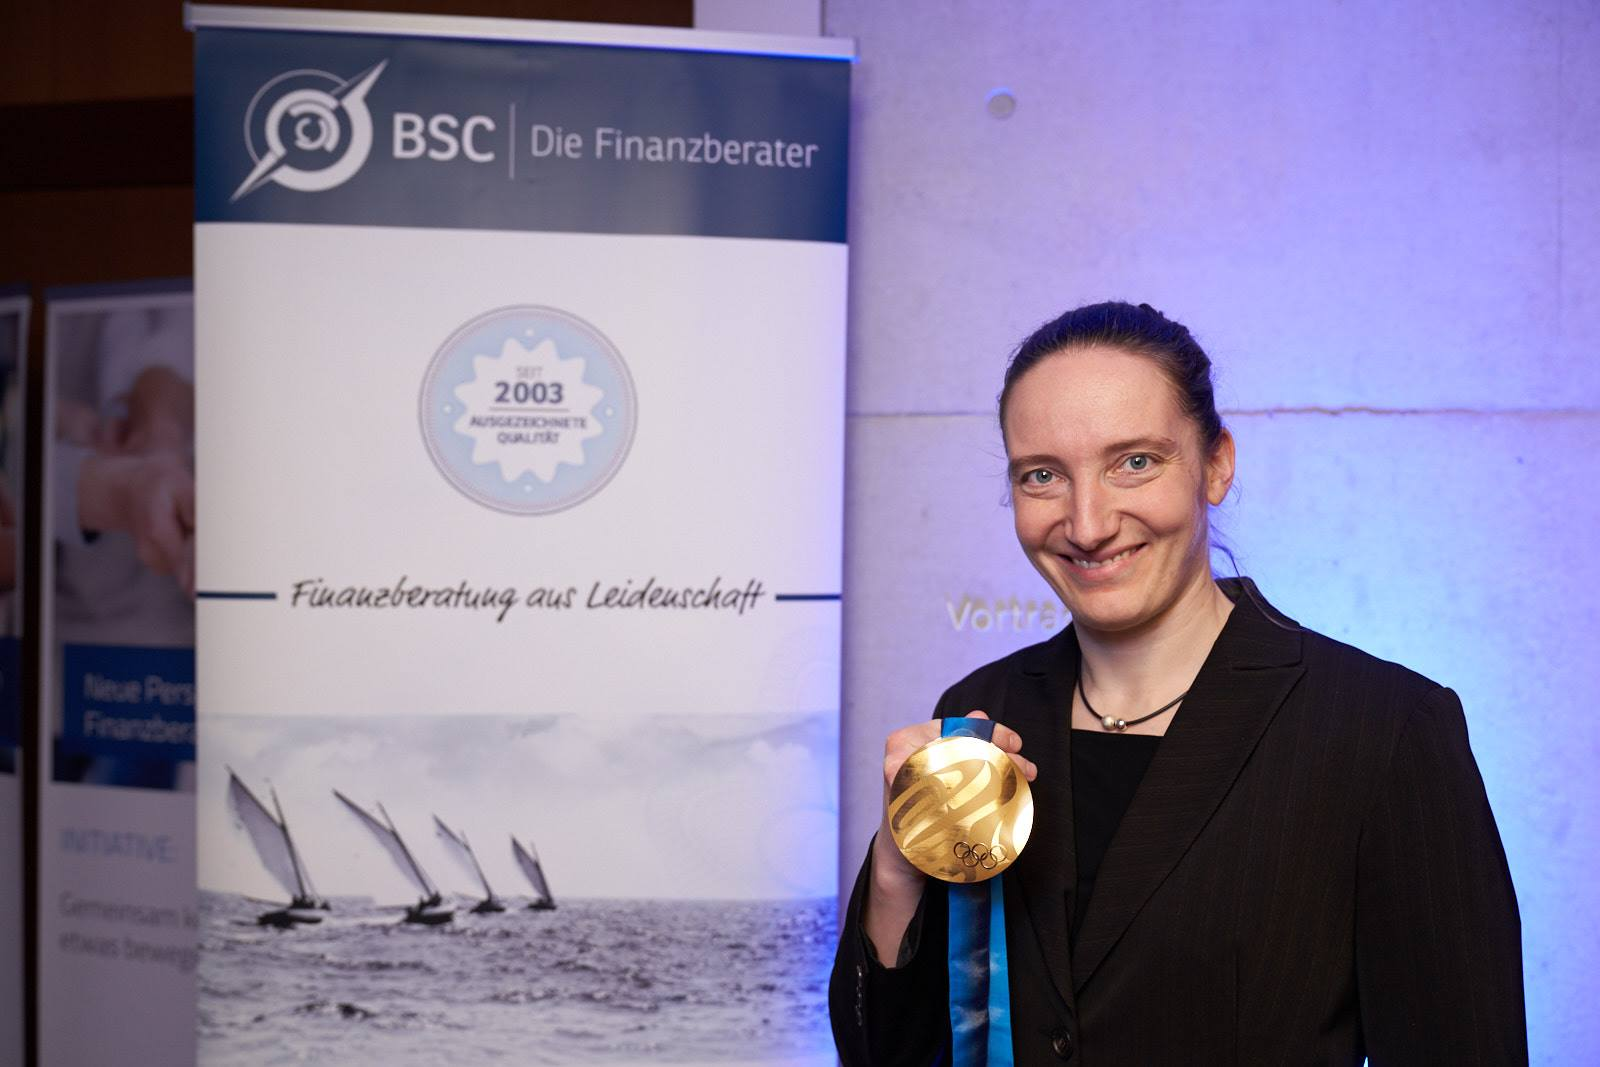 Langjährige BSC-Kundin und Olympiasiegerin im Rennrodeln: Tatjana Hüfner